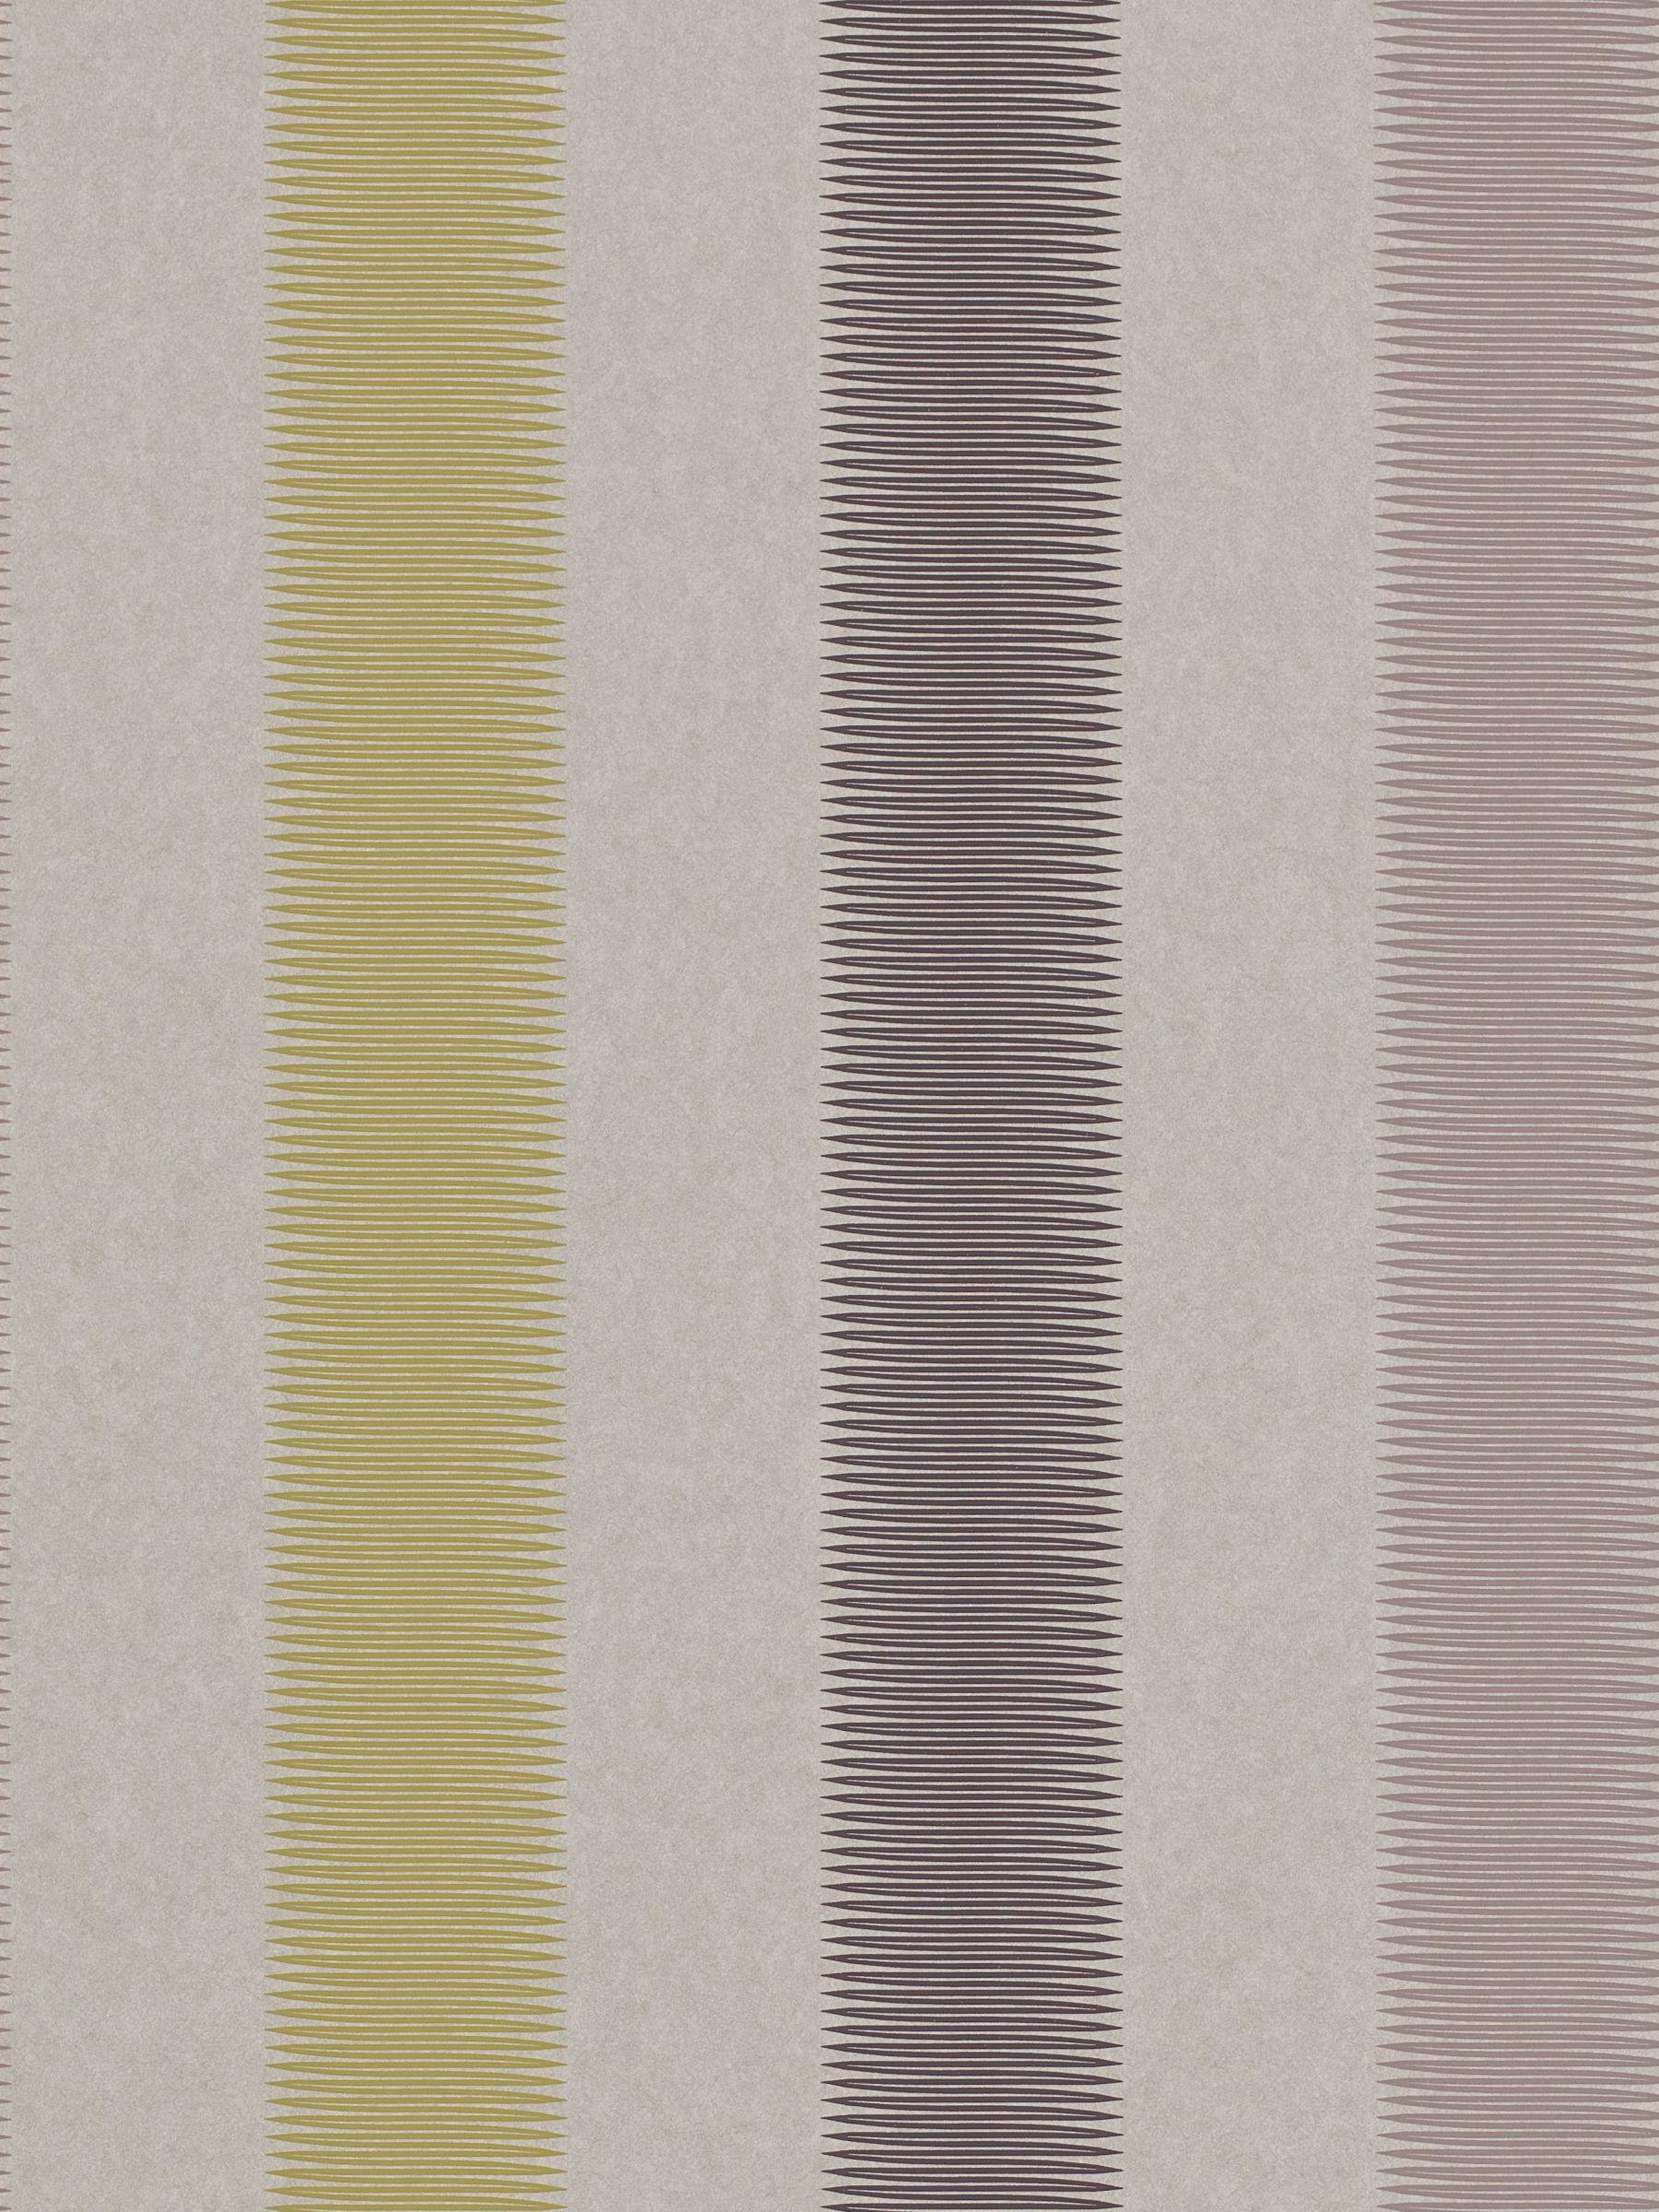 Harlequin Harlequin Tambo Wallpaper